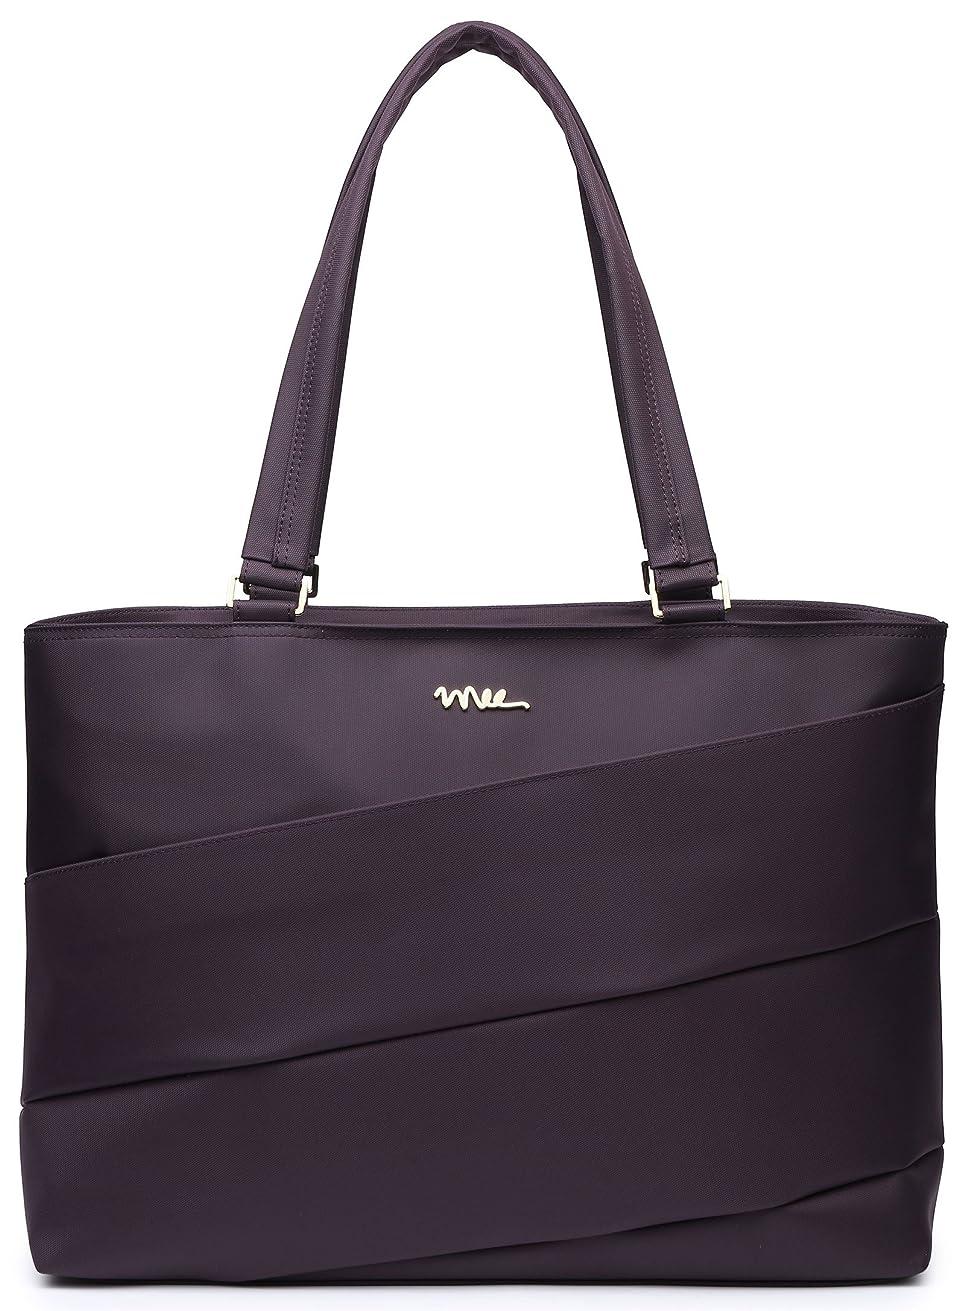 NNEE 15 15.6 Inch Water Resistance Nylon Laptop Tote Bag Notebook Computer Work Handbag Travel Carrying Bag - Purple